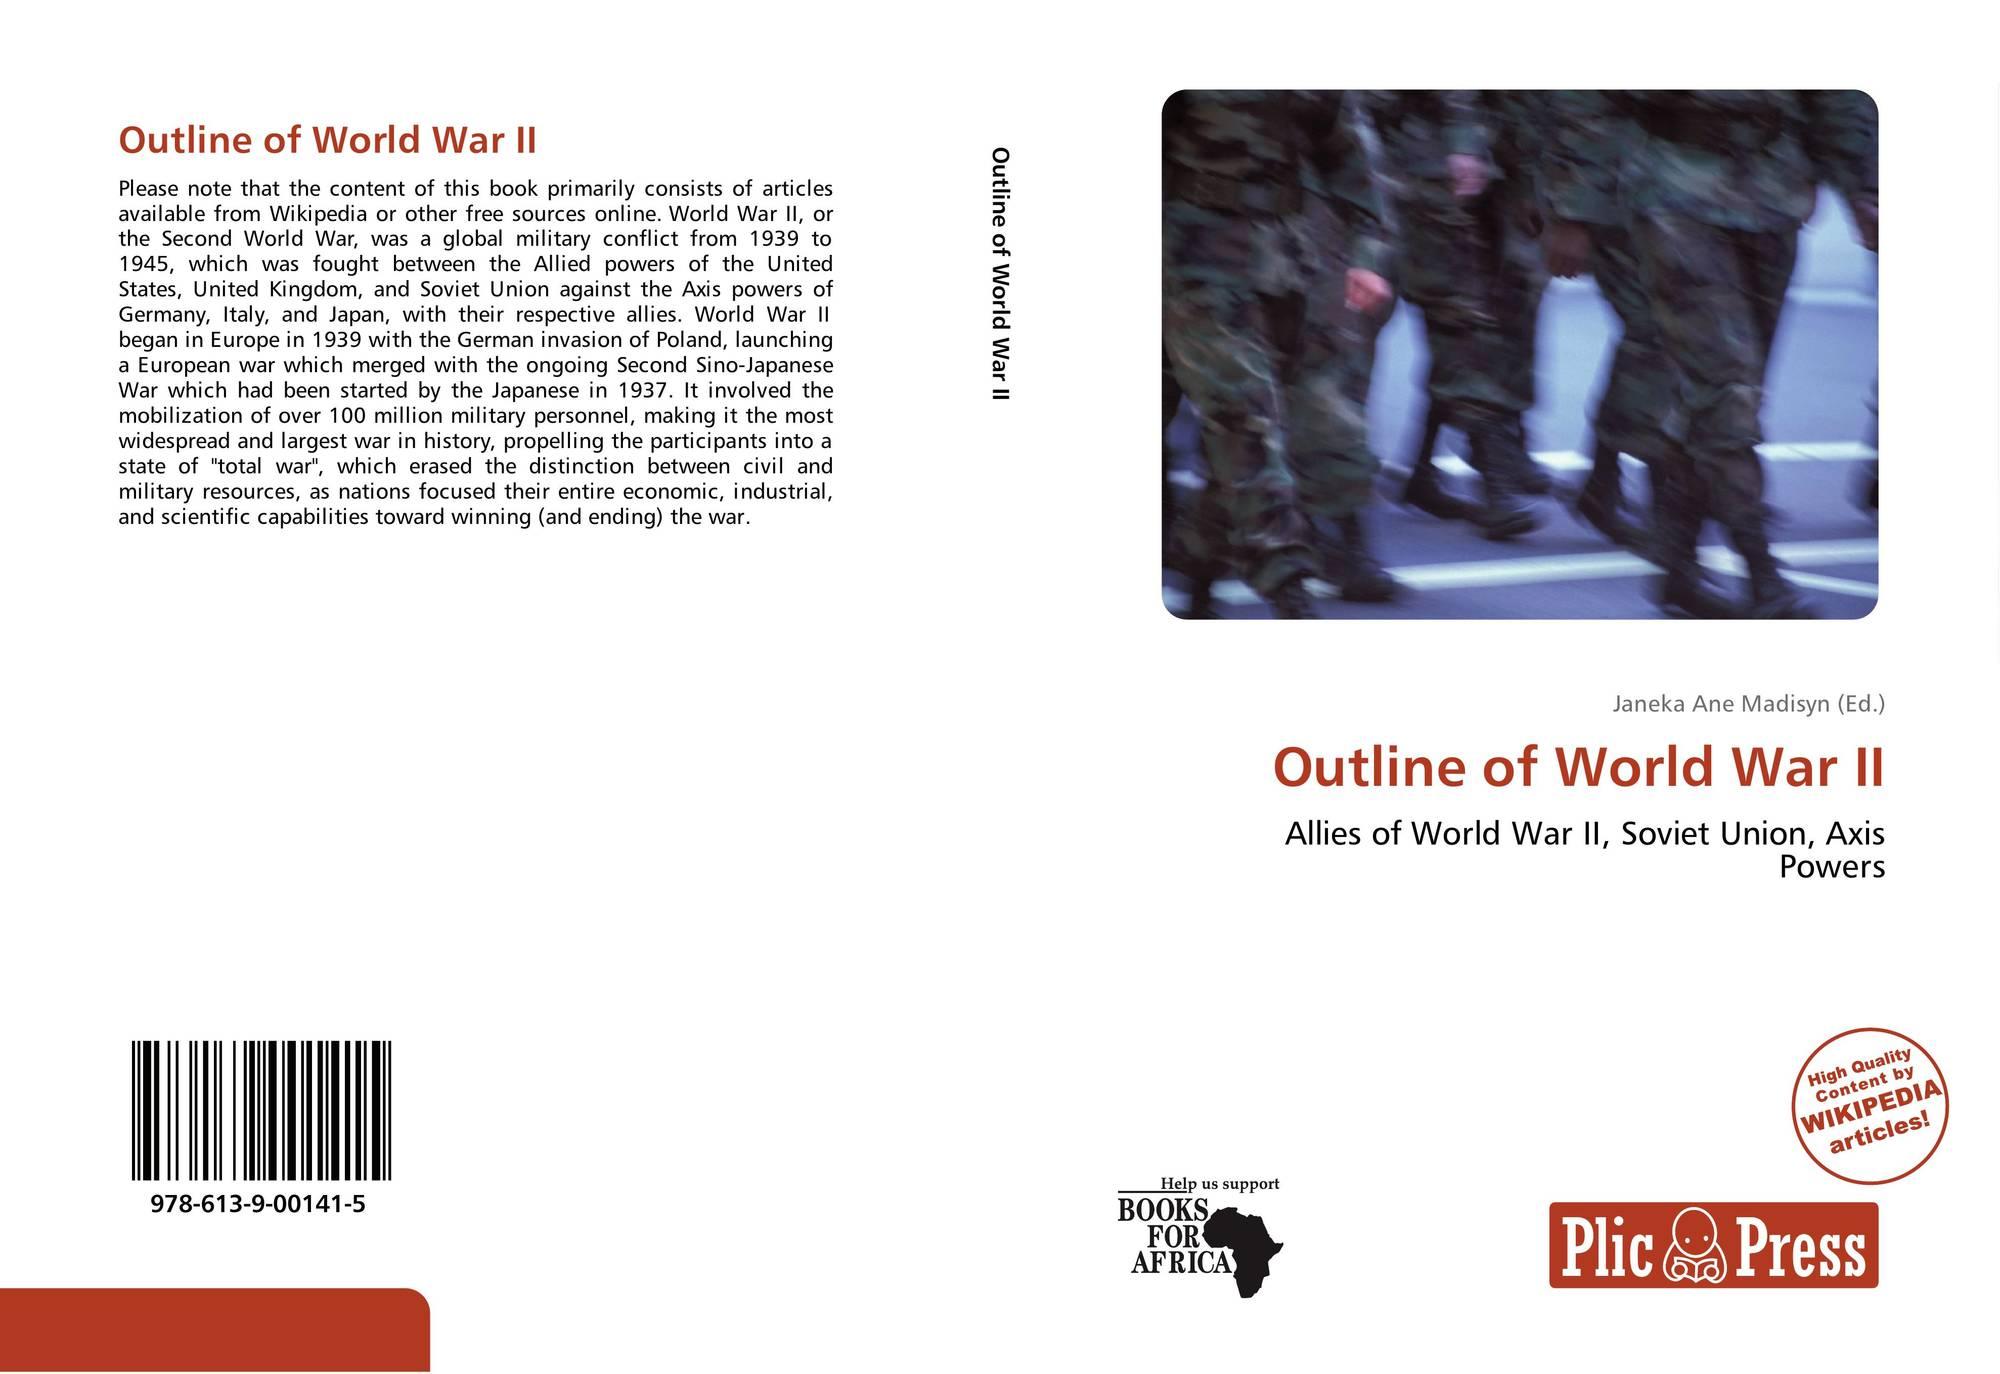 Outline of World War II, 978-613-9-00141-5, 6139001412